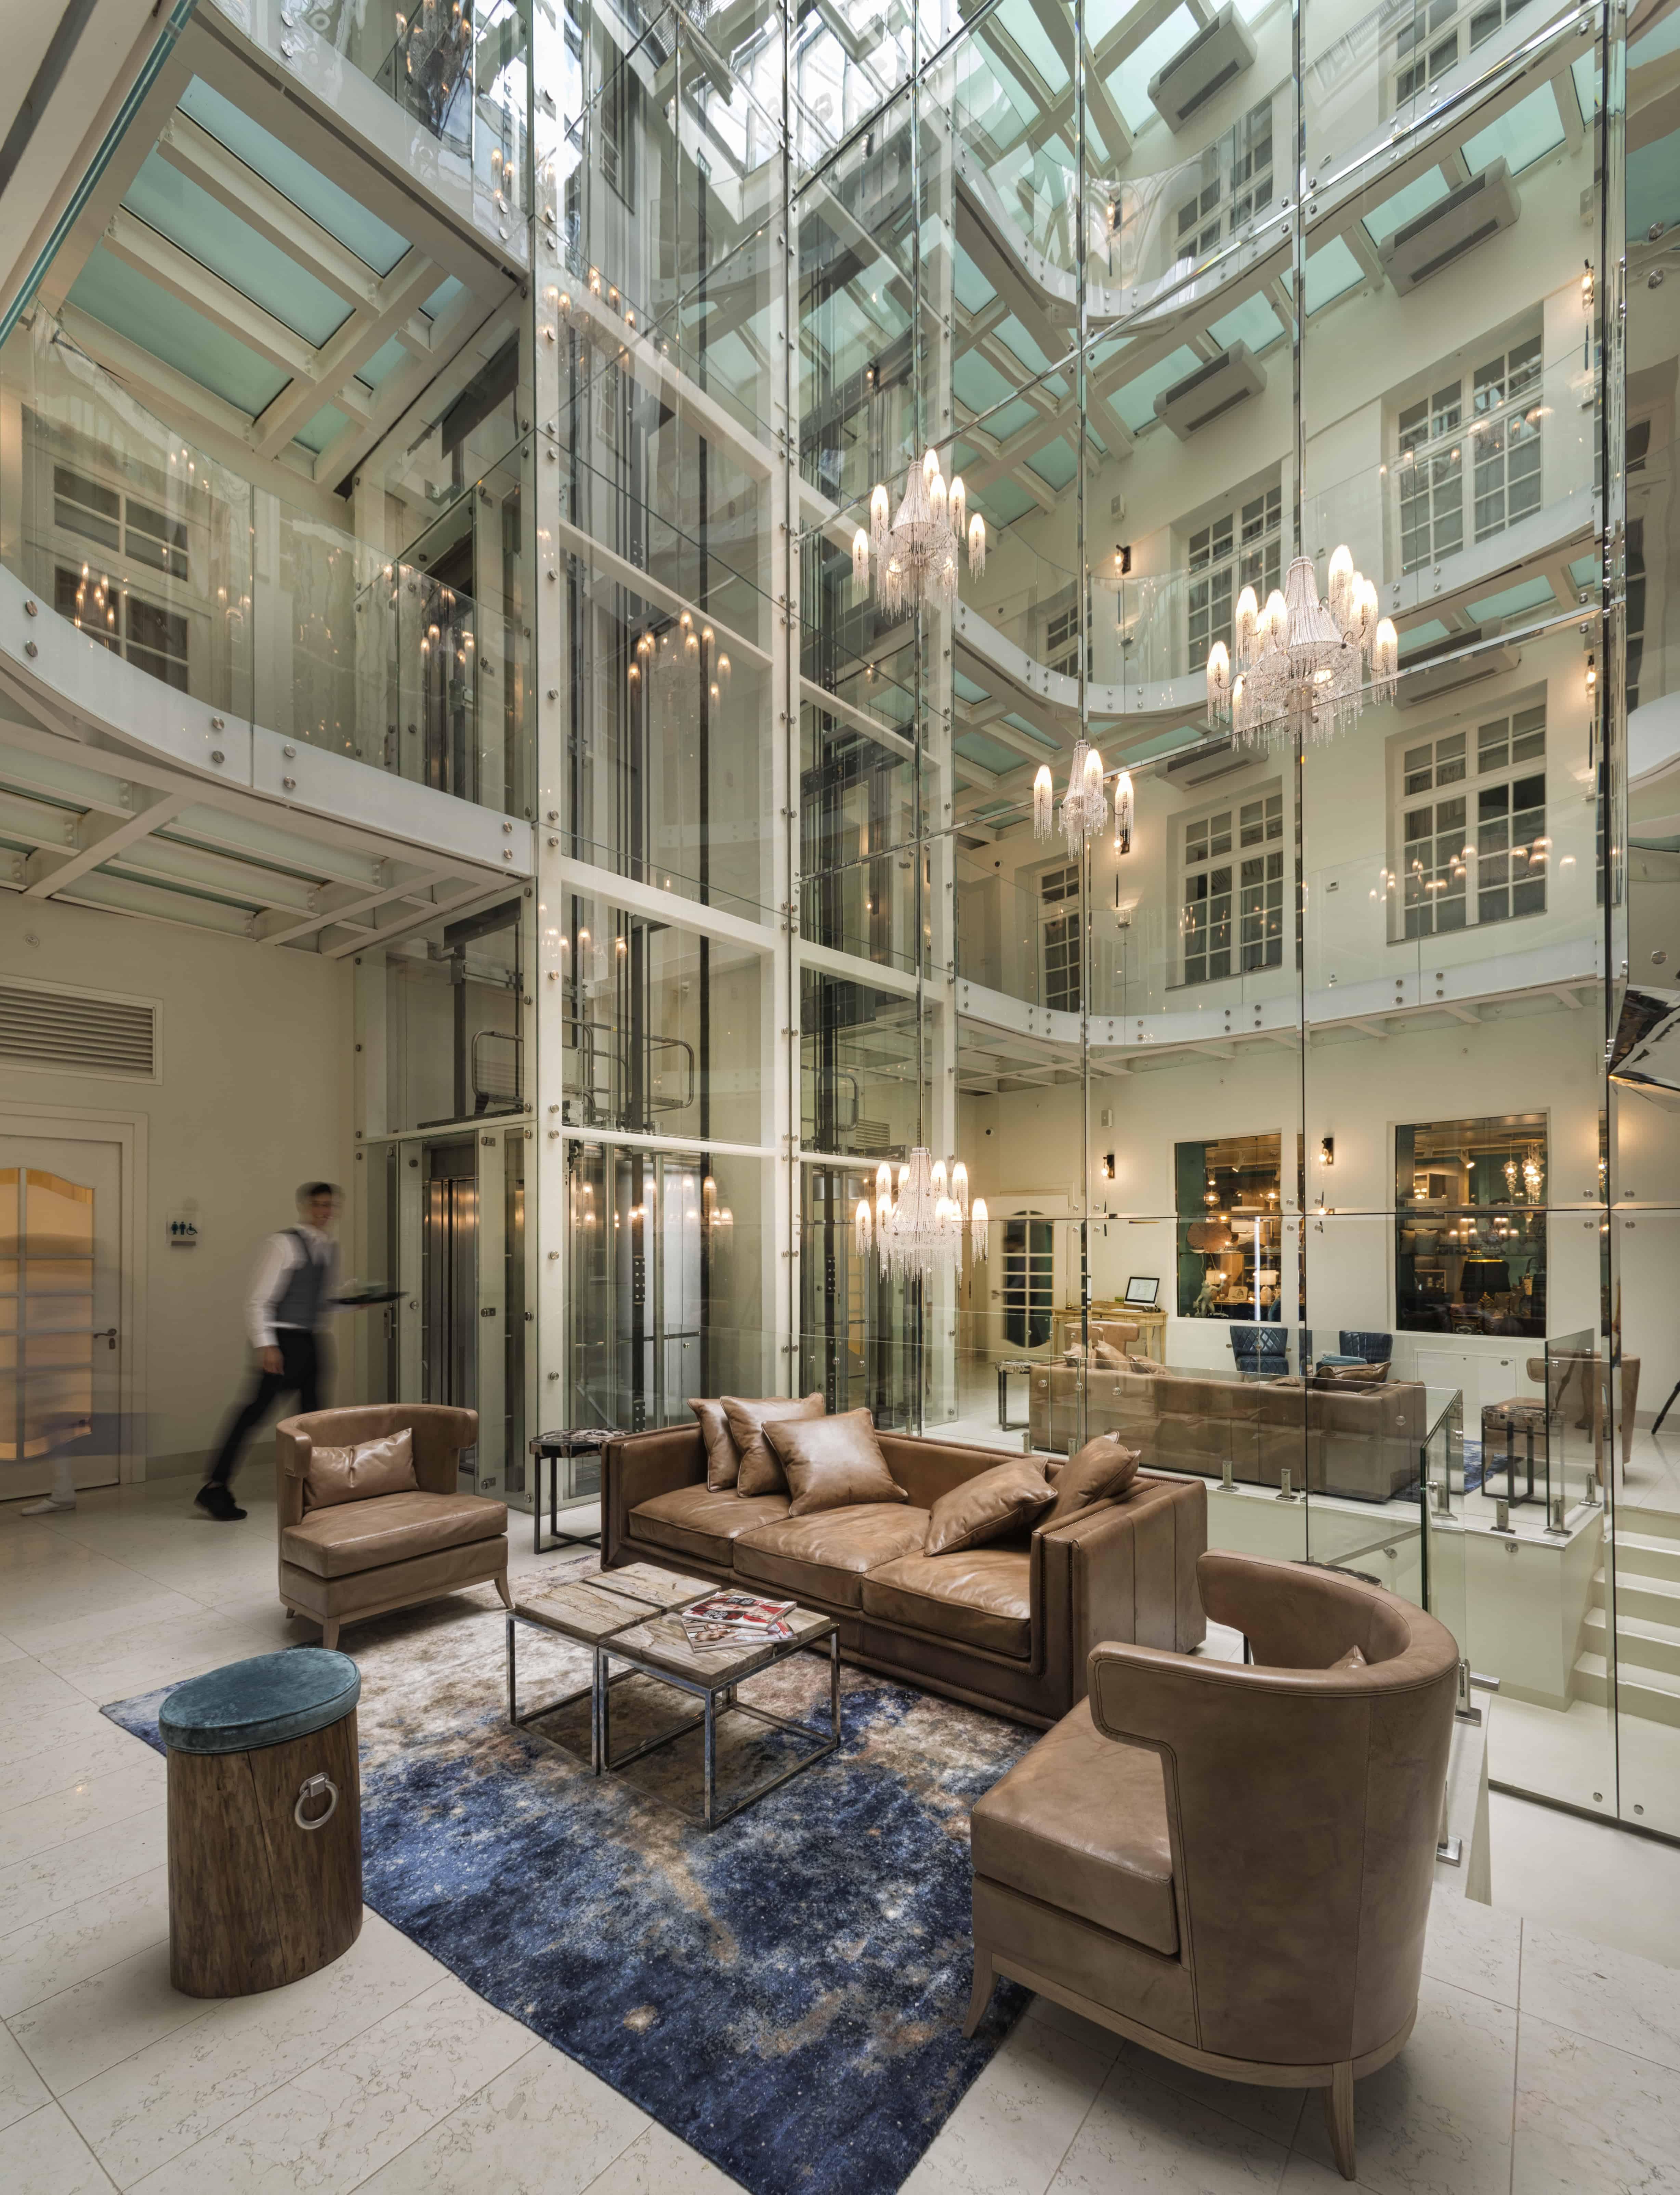 Design Hotel Relais Le Chevalier The Design Tourist